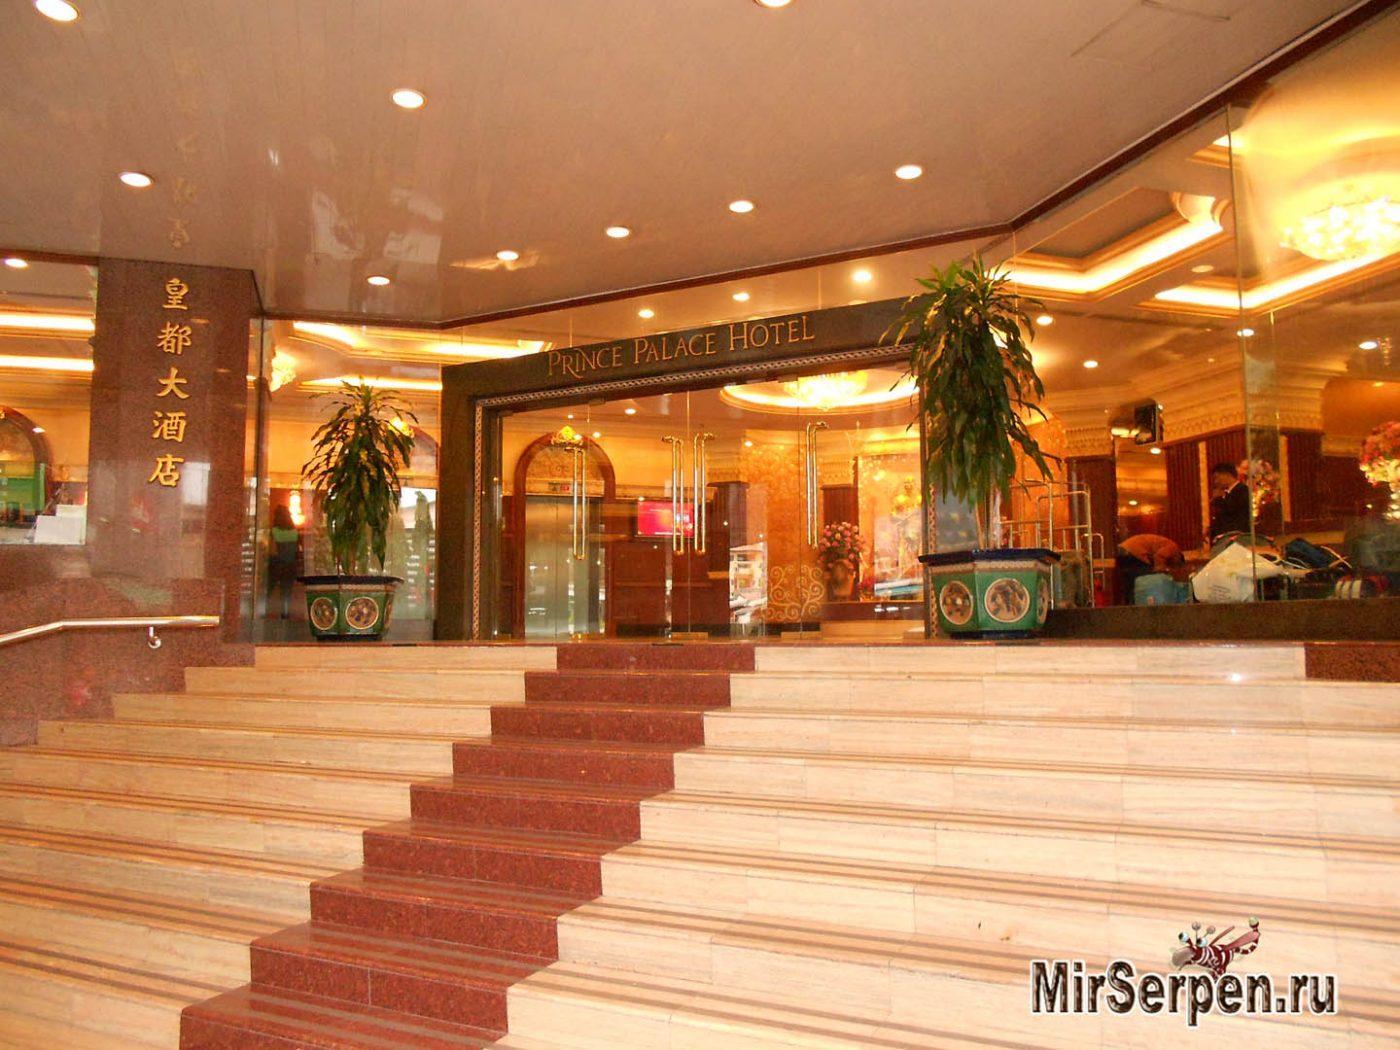 Photo of Общее описание отеля Prince Palace 4*, Бангкок, Таиланд